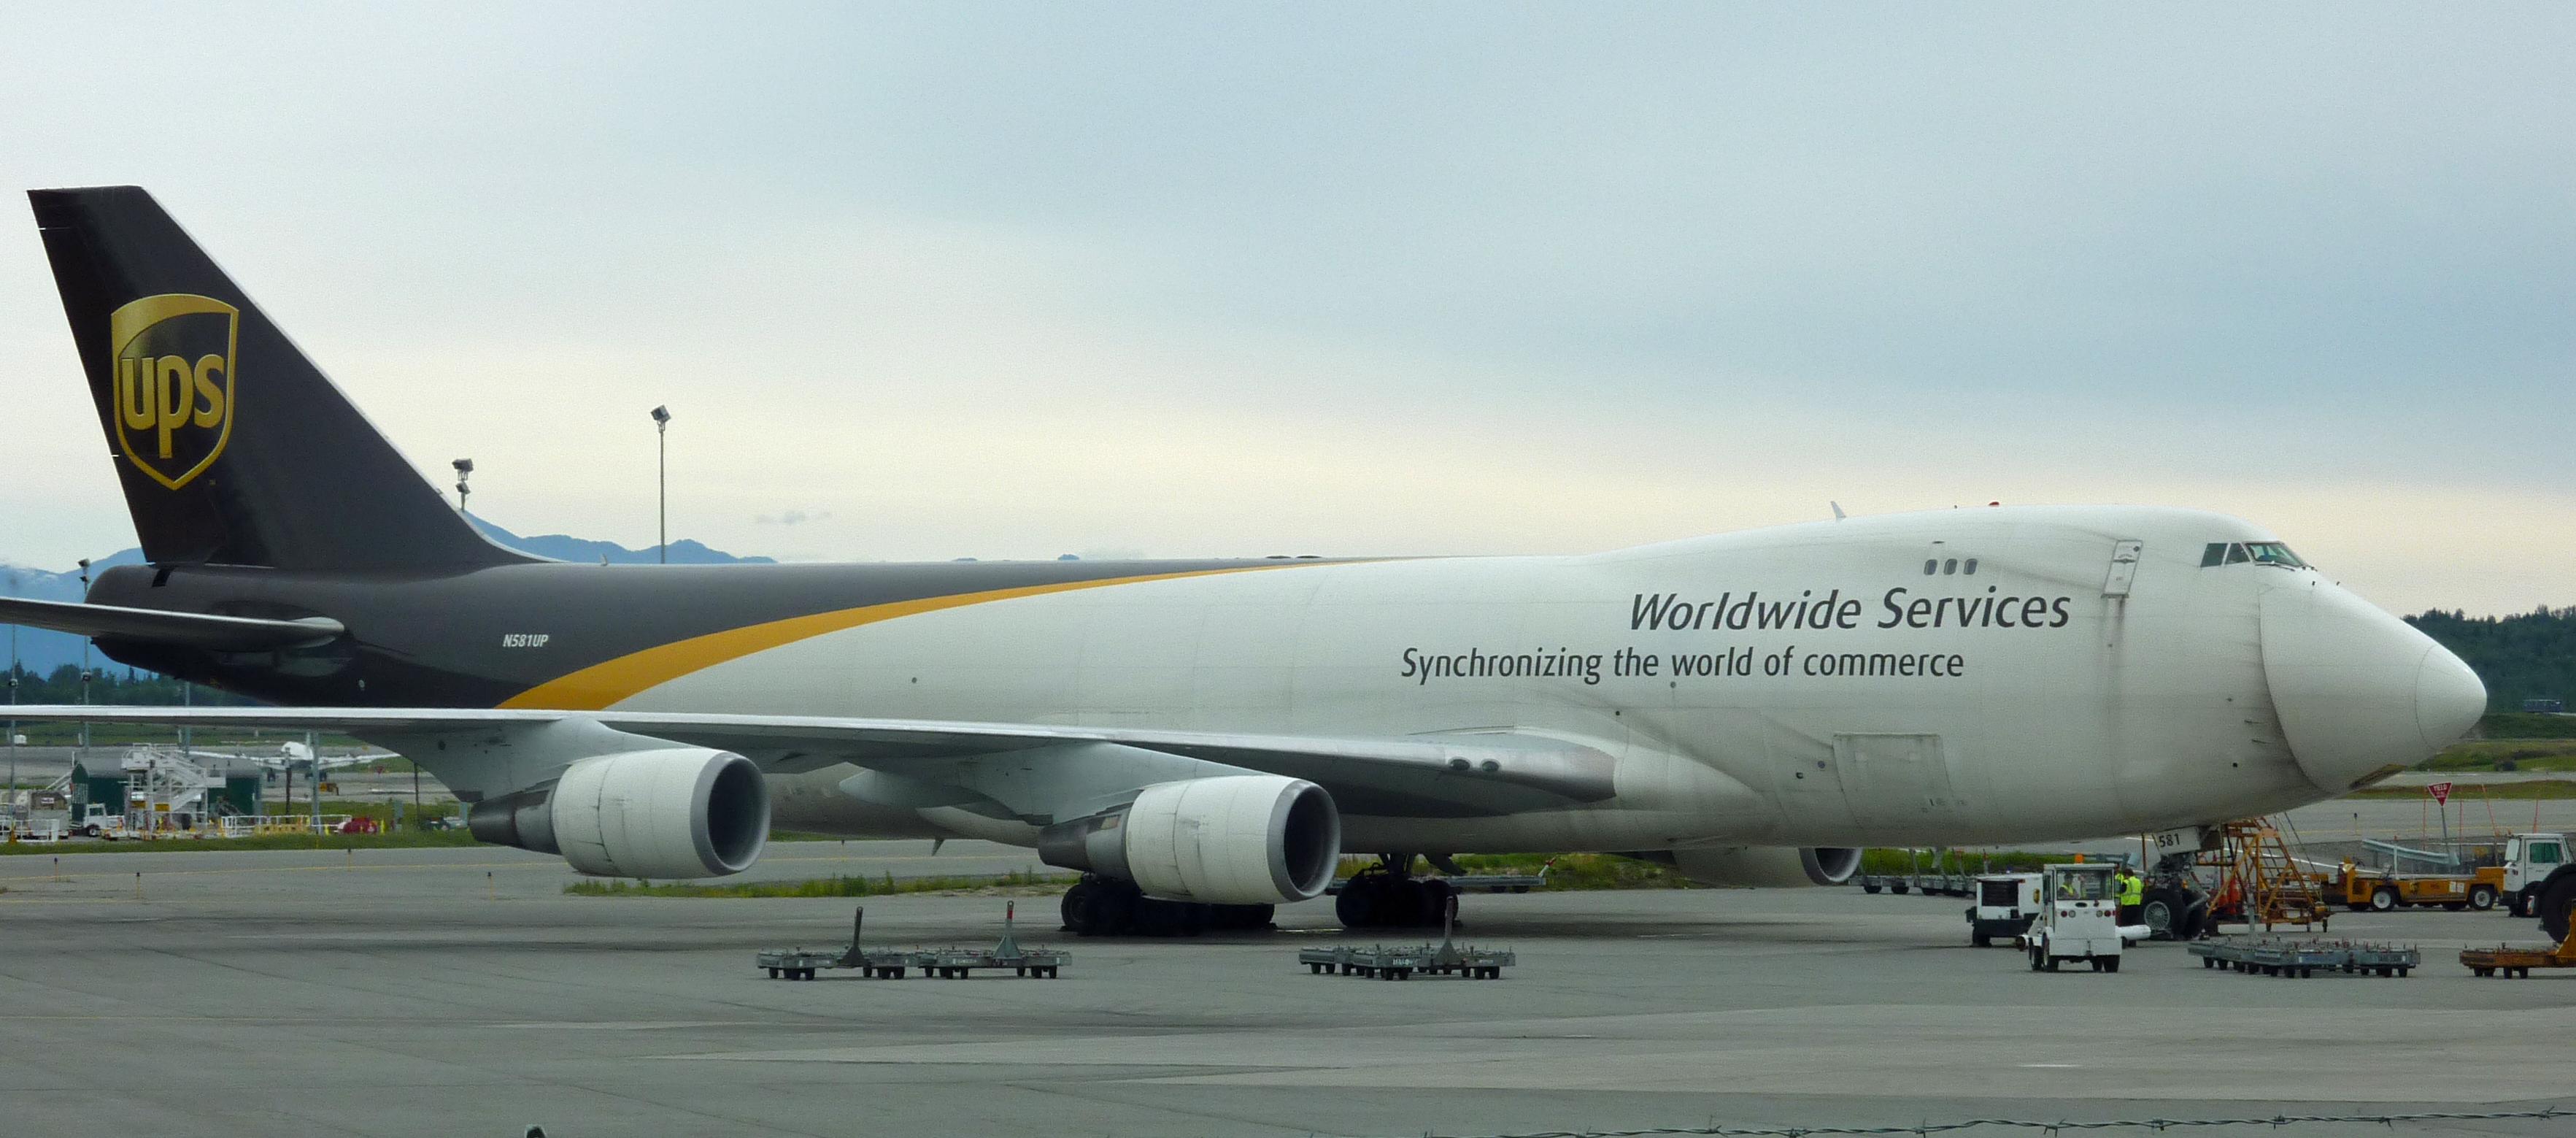 UPS_747_N581UP.jpg